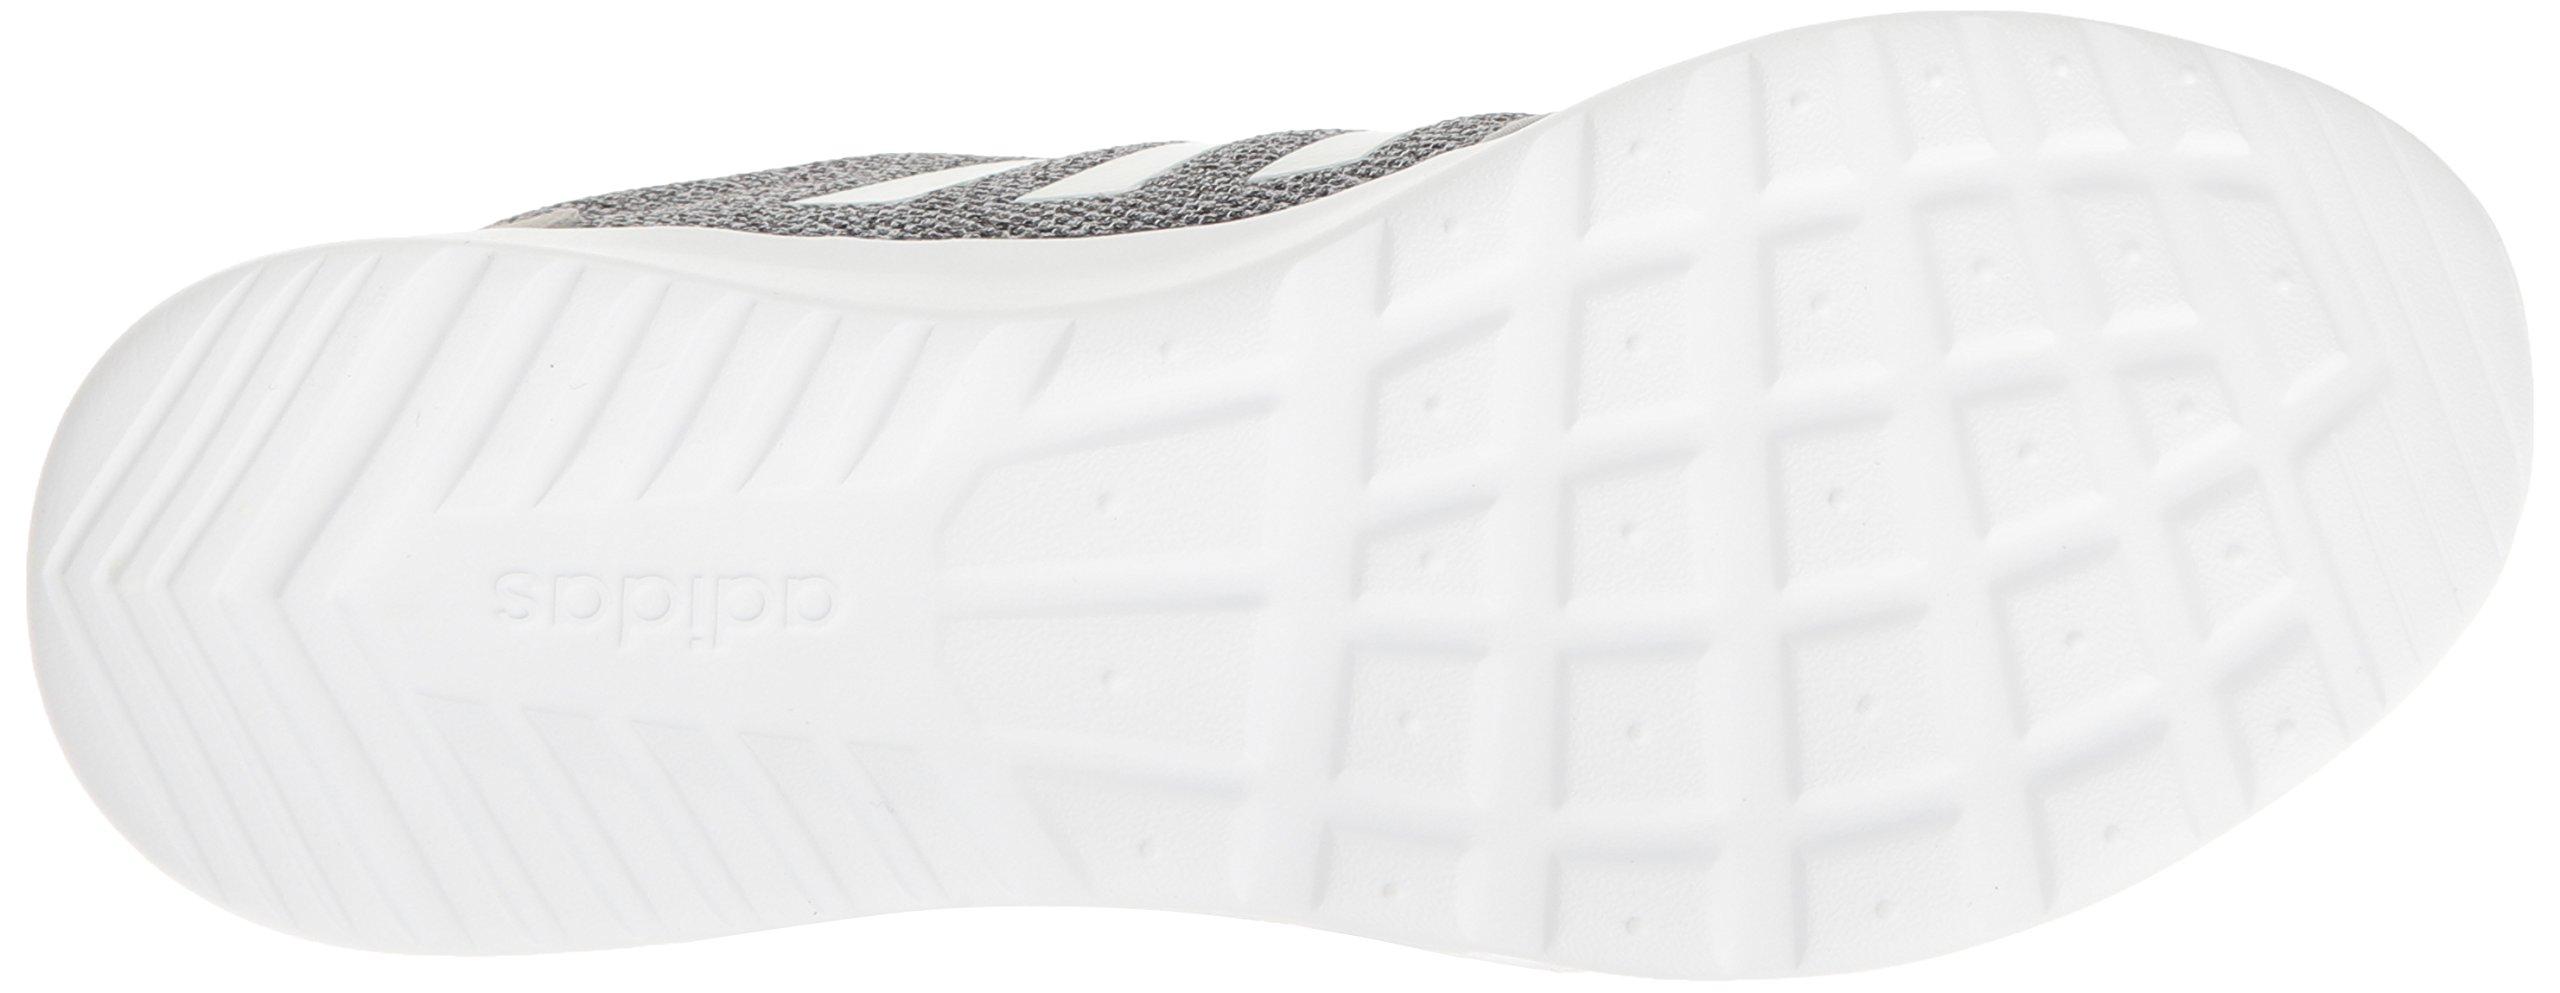 adidas Women's Cloudfoam Qt Racer w Running Shoe, Clear Onix/White/Light Onix, 5 M US by adidas (Image #3)